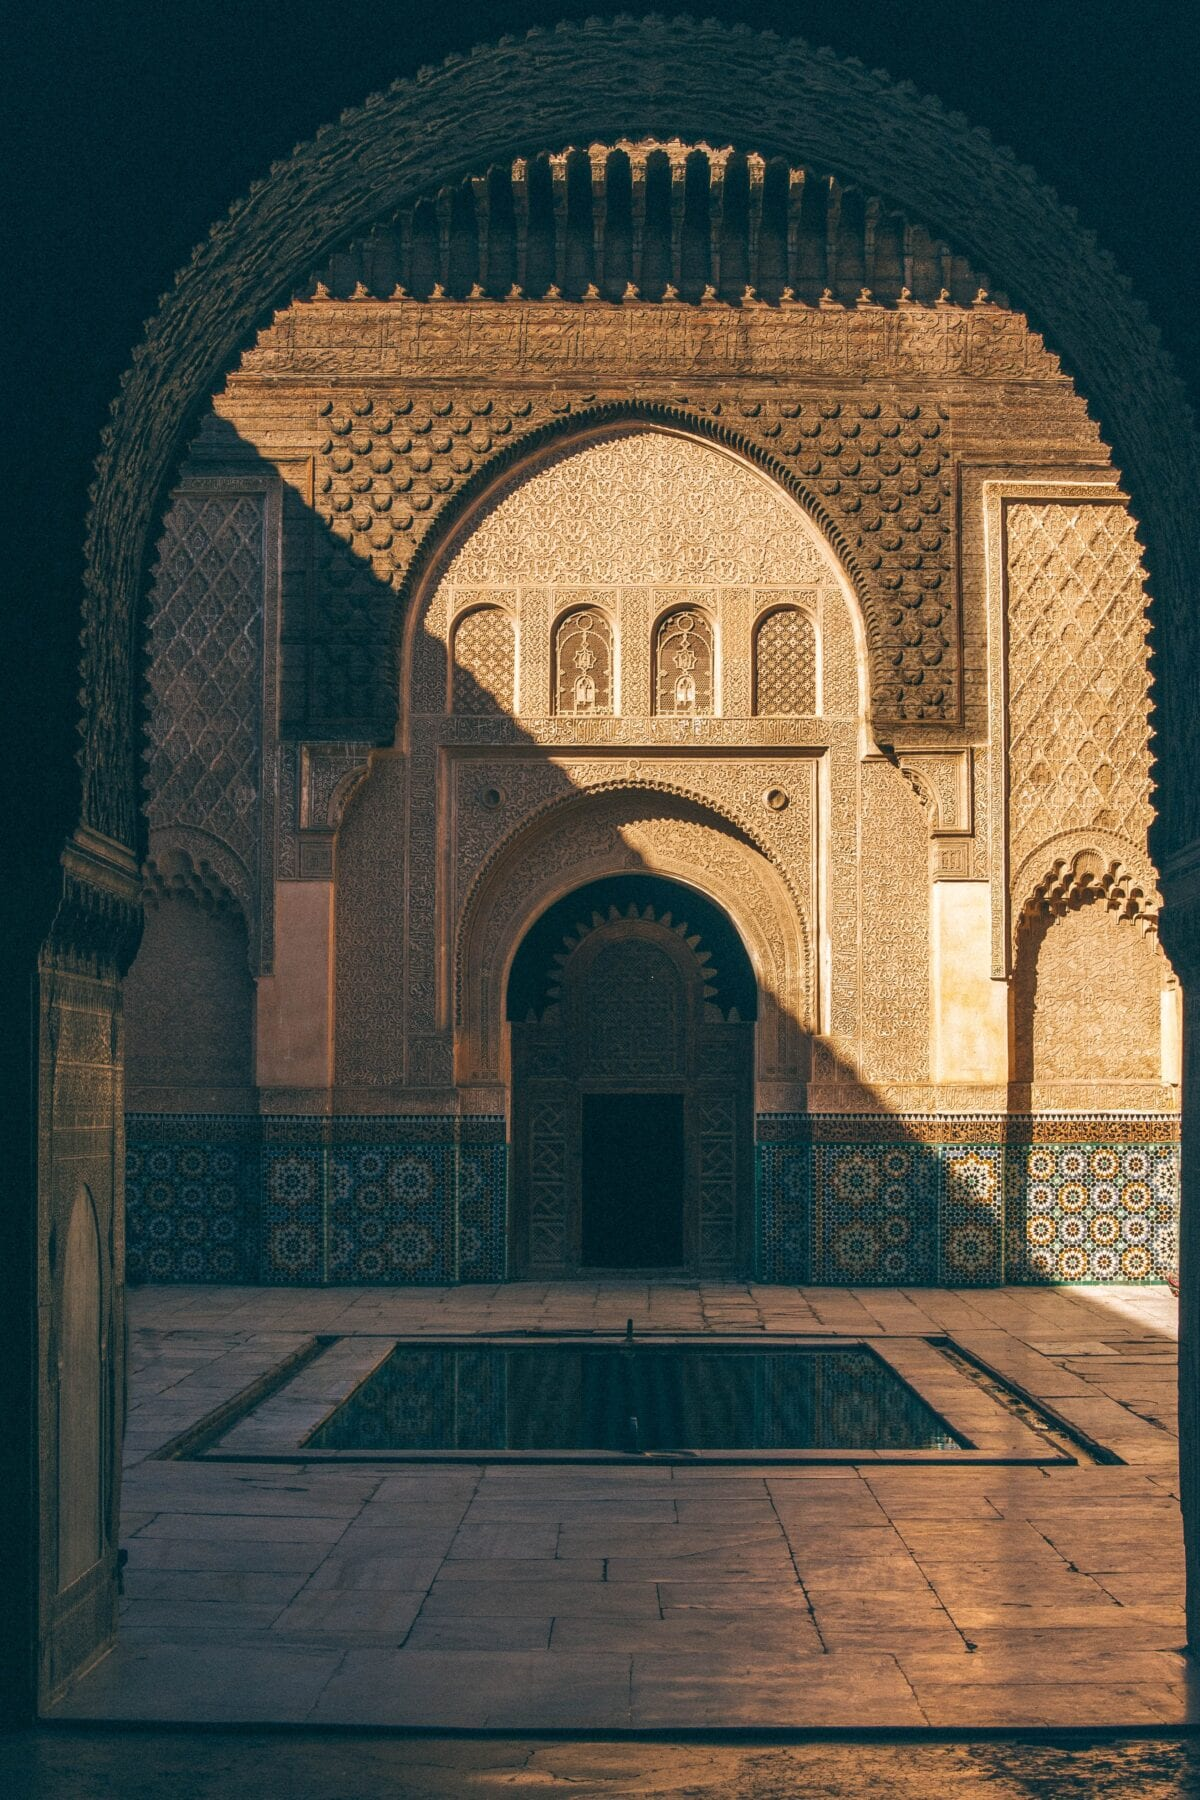 Binnenplaats Marokko